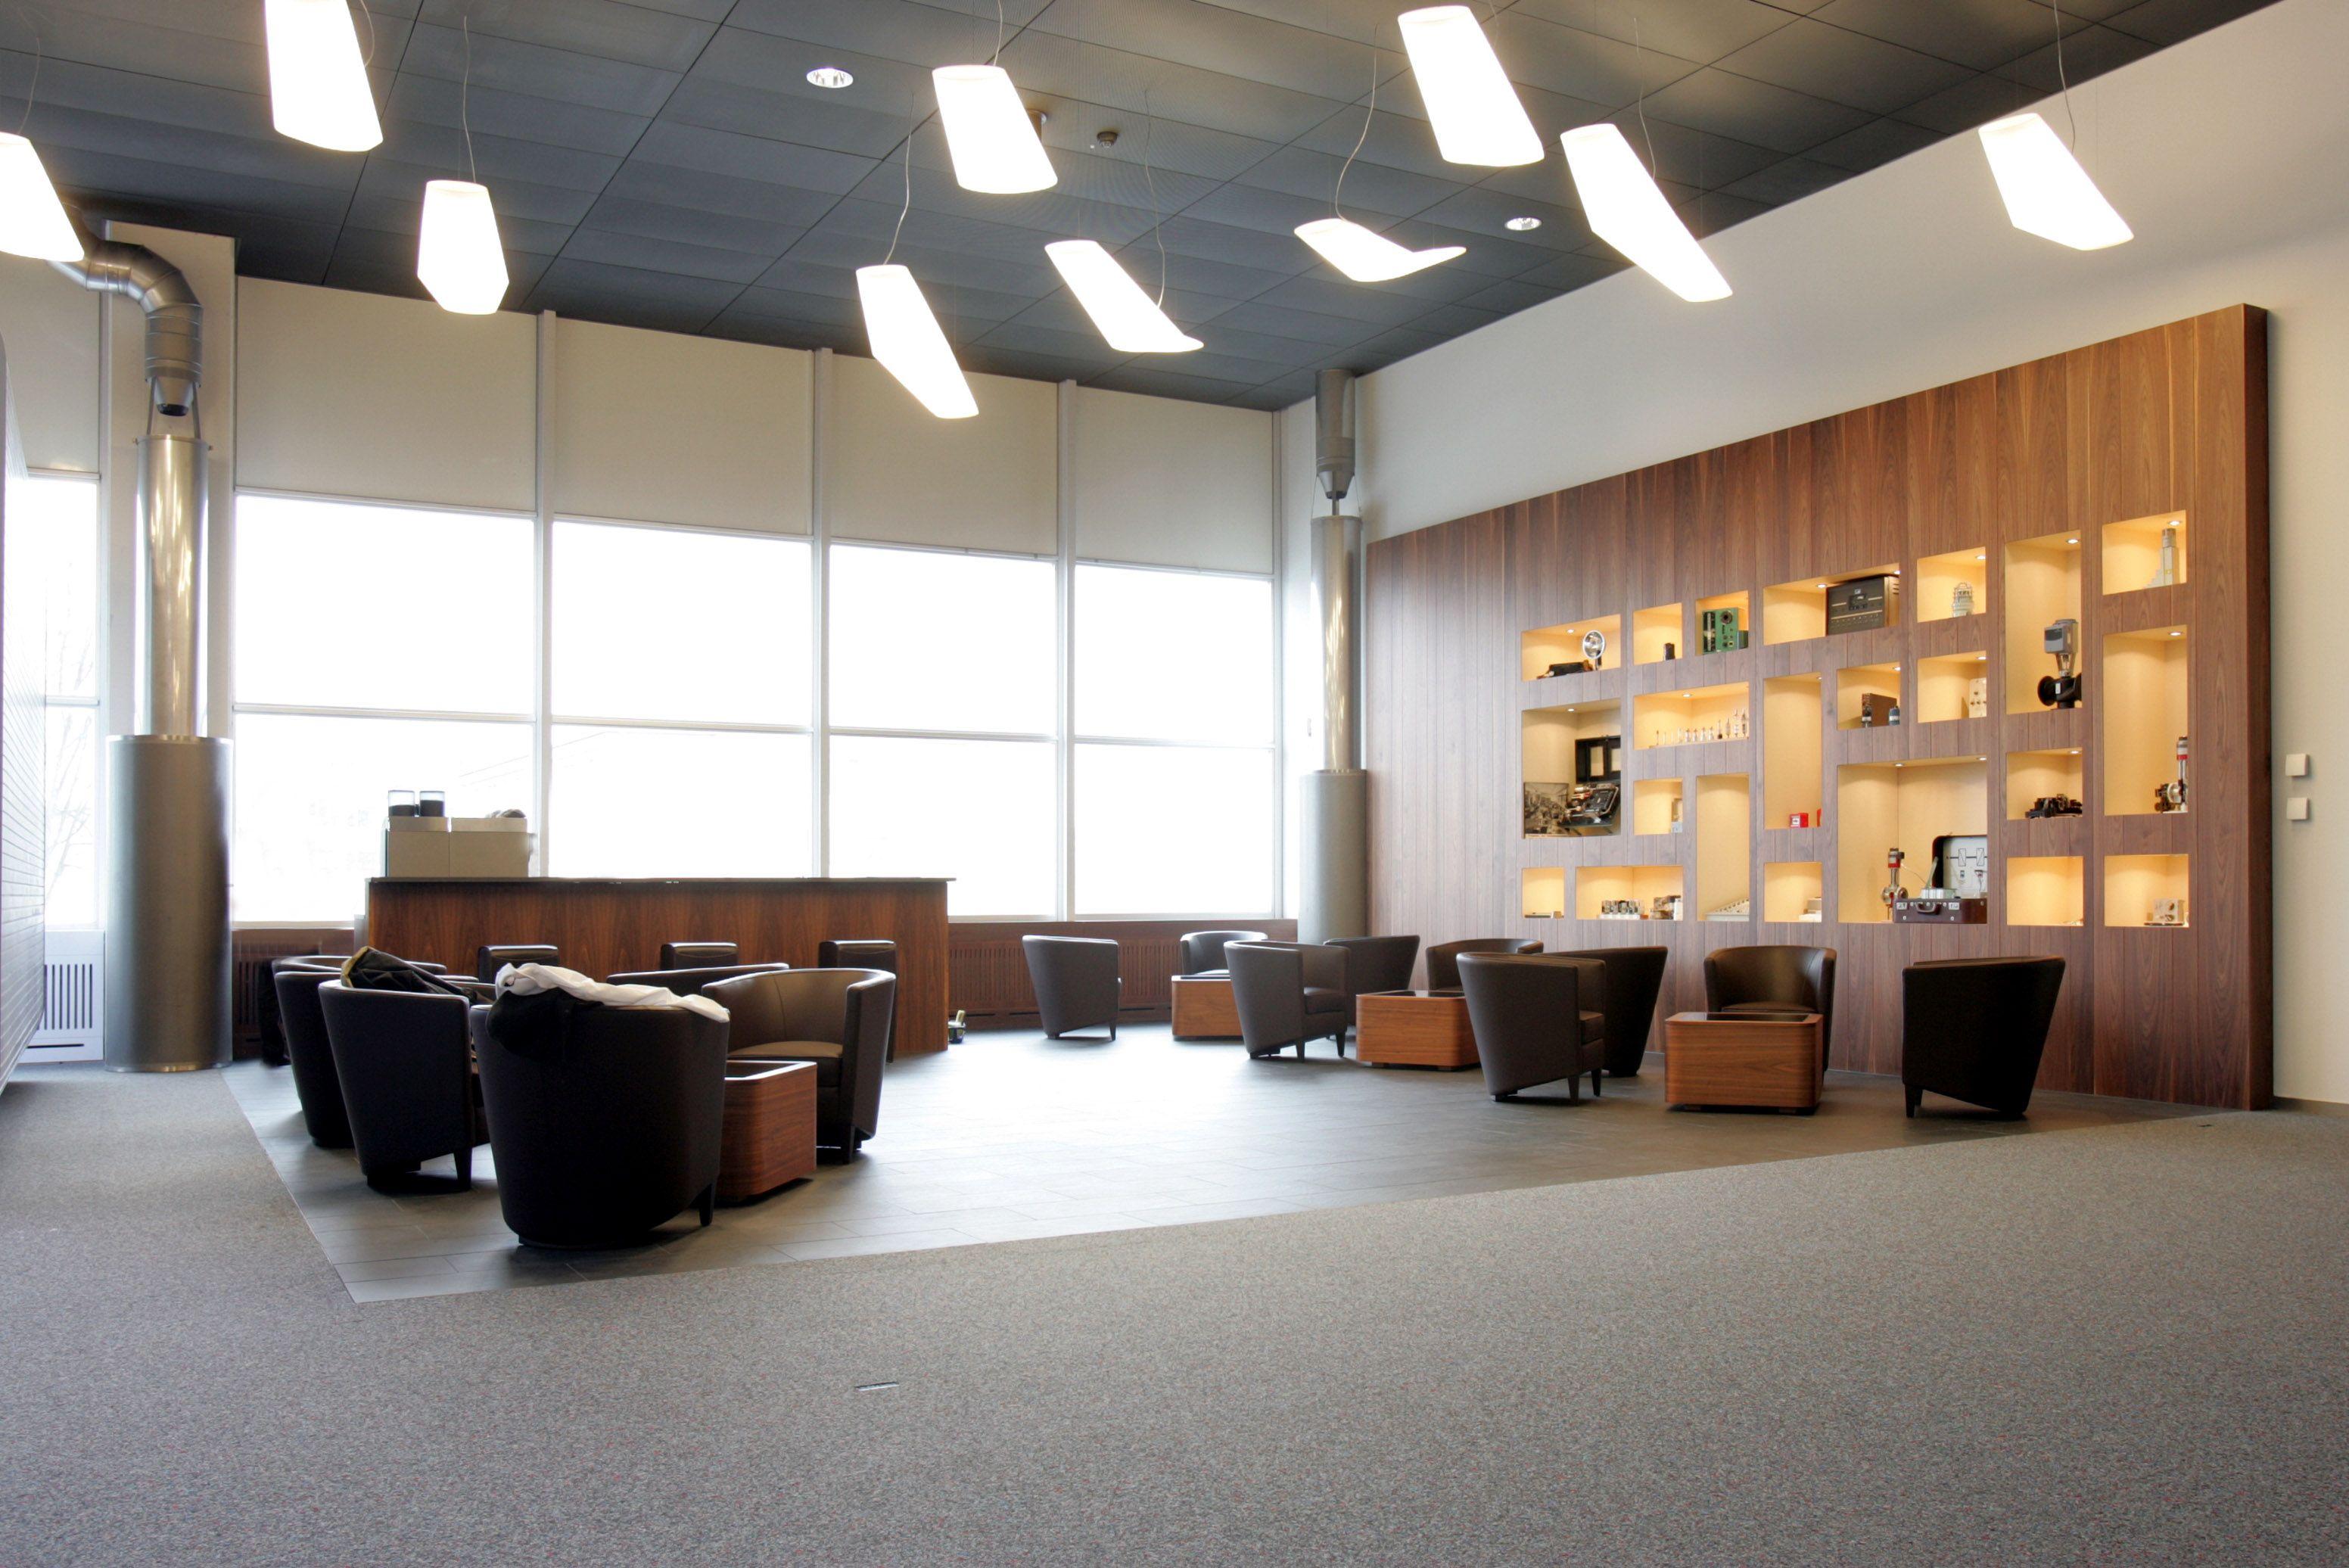 office lounge design. Office Lounge Design E